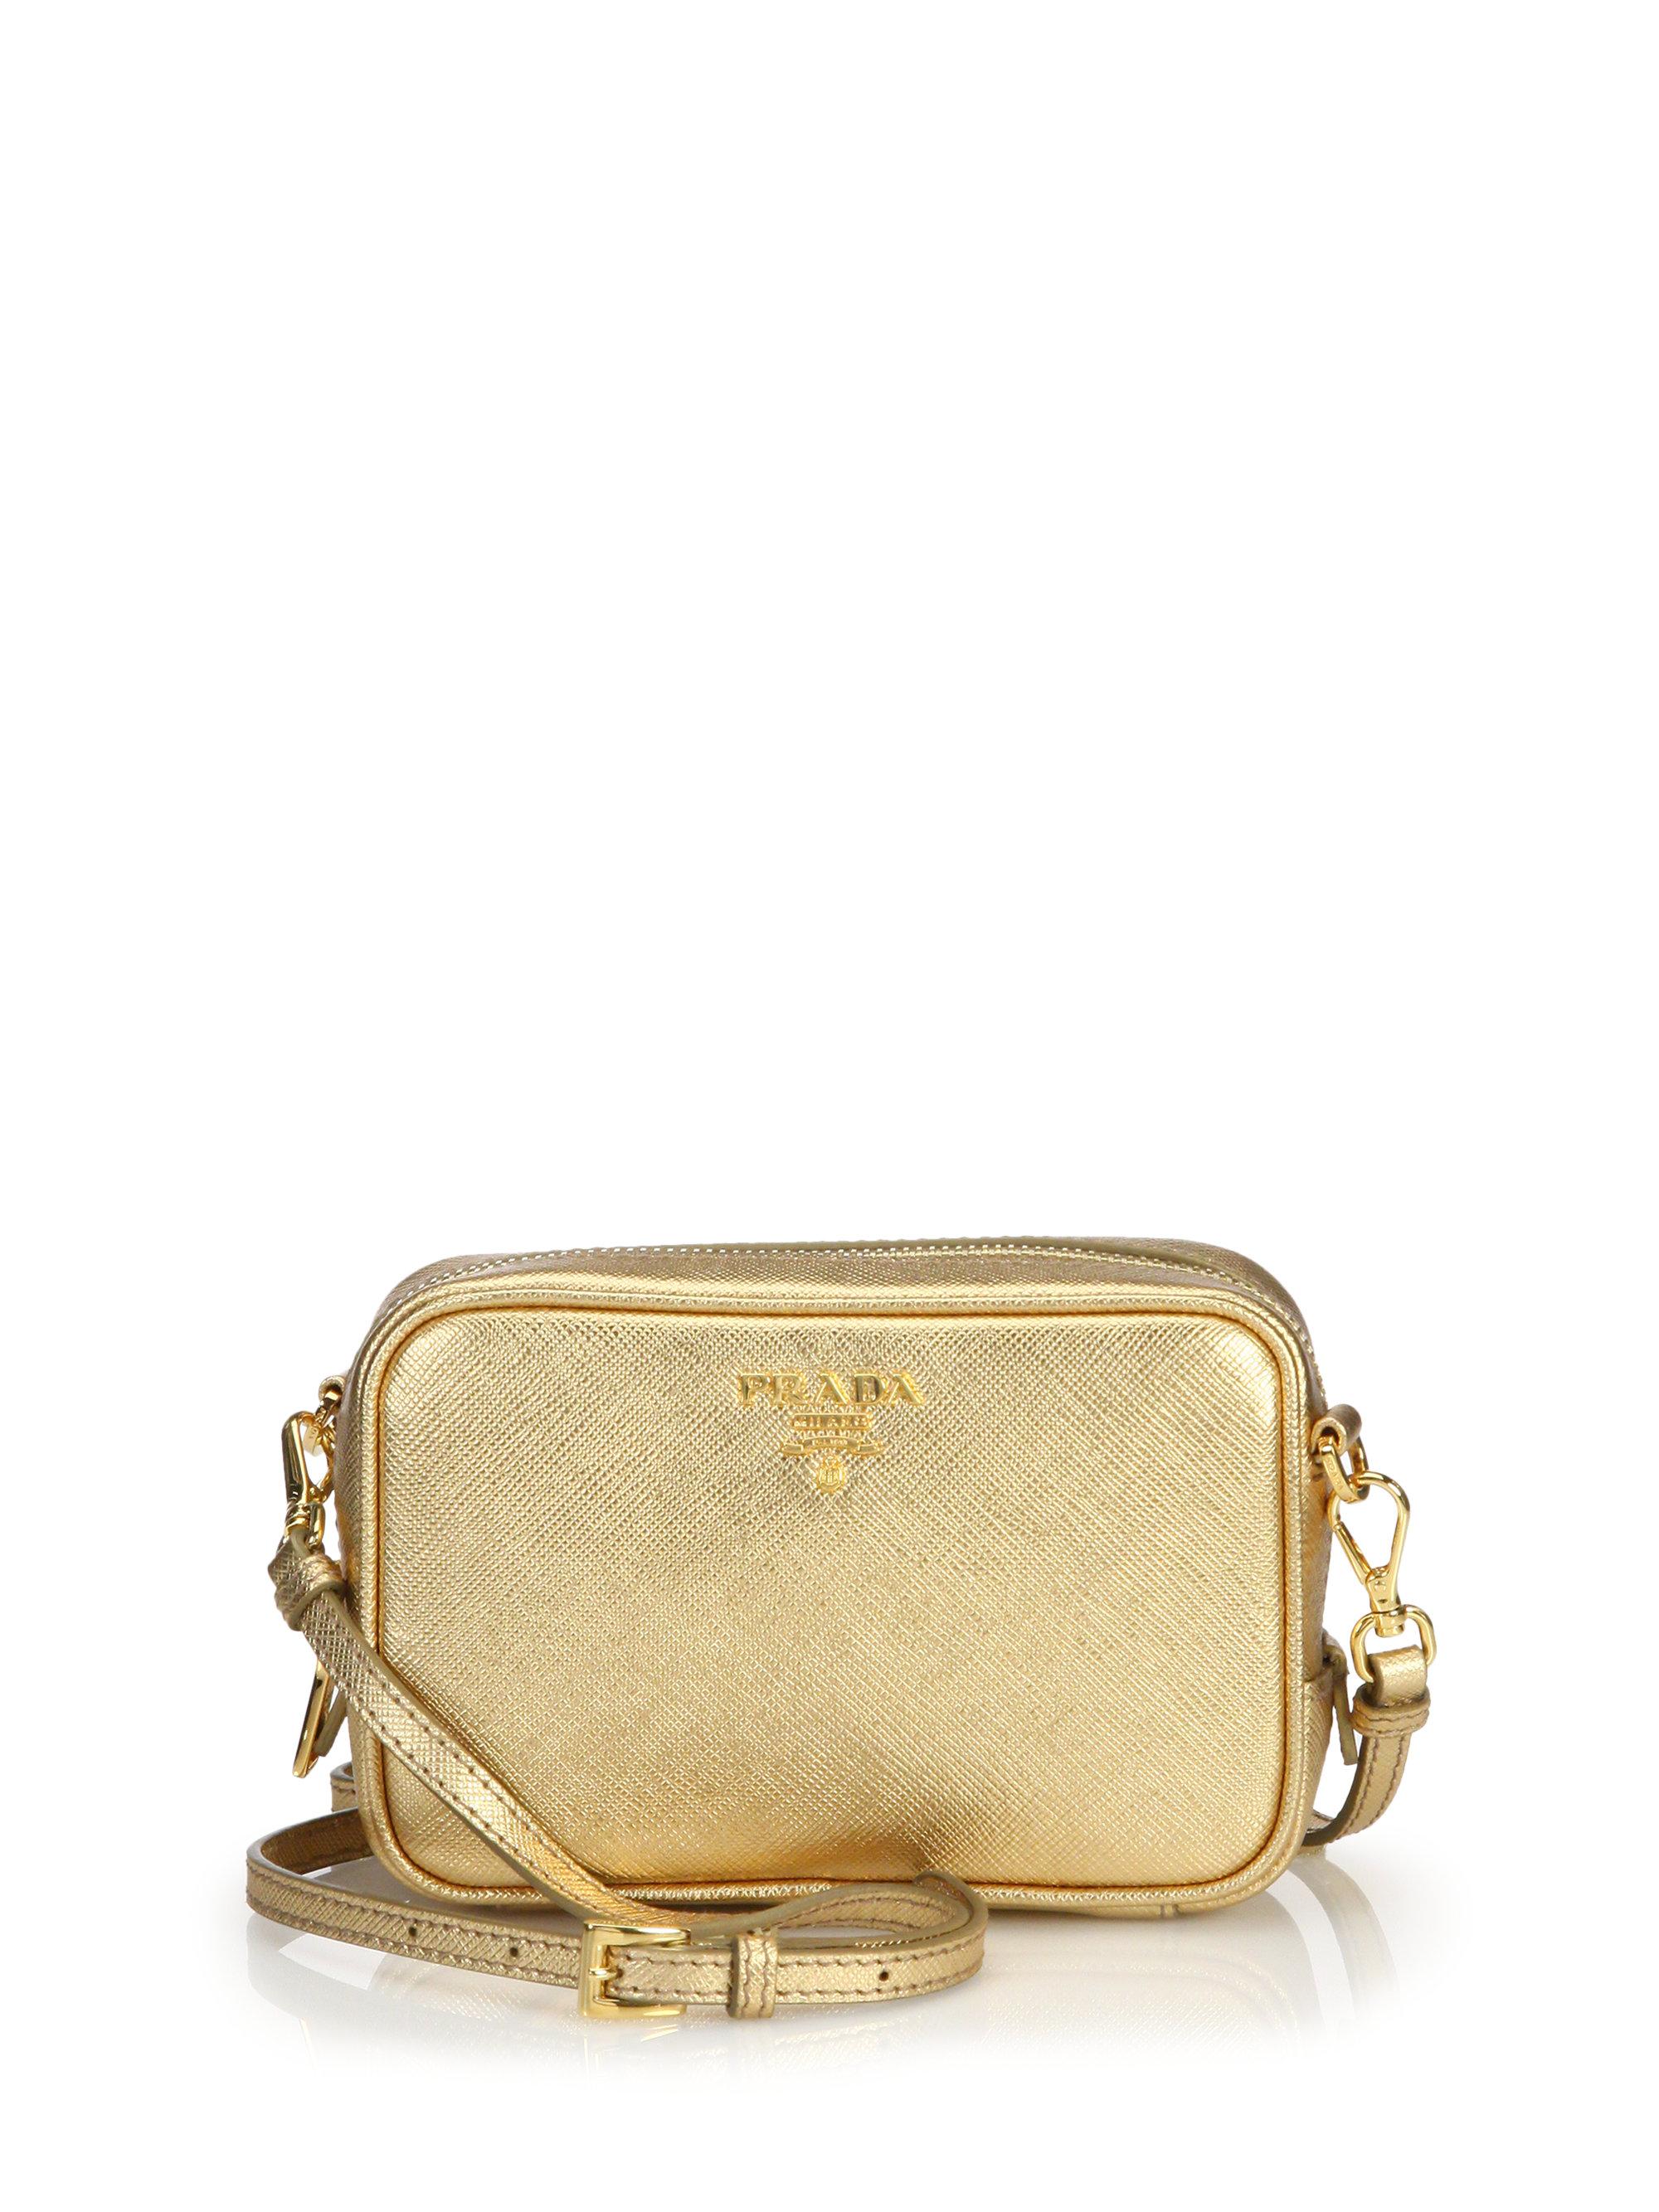 Prada Metallic Saffiano Leather Camera Bag in Gold   Lyst